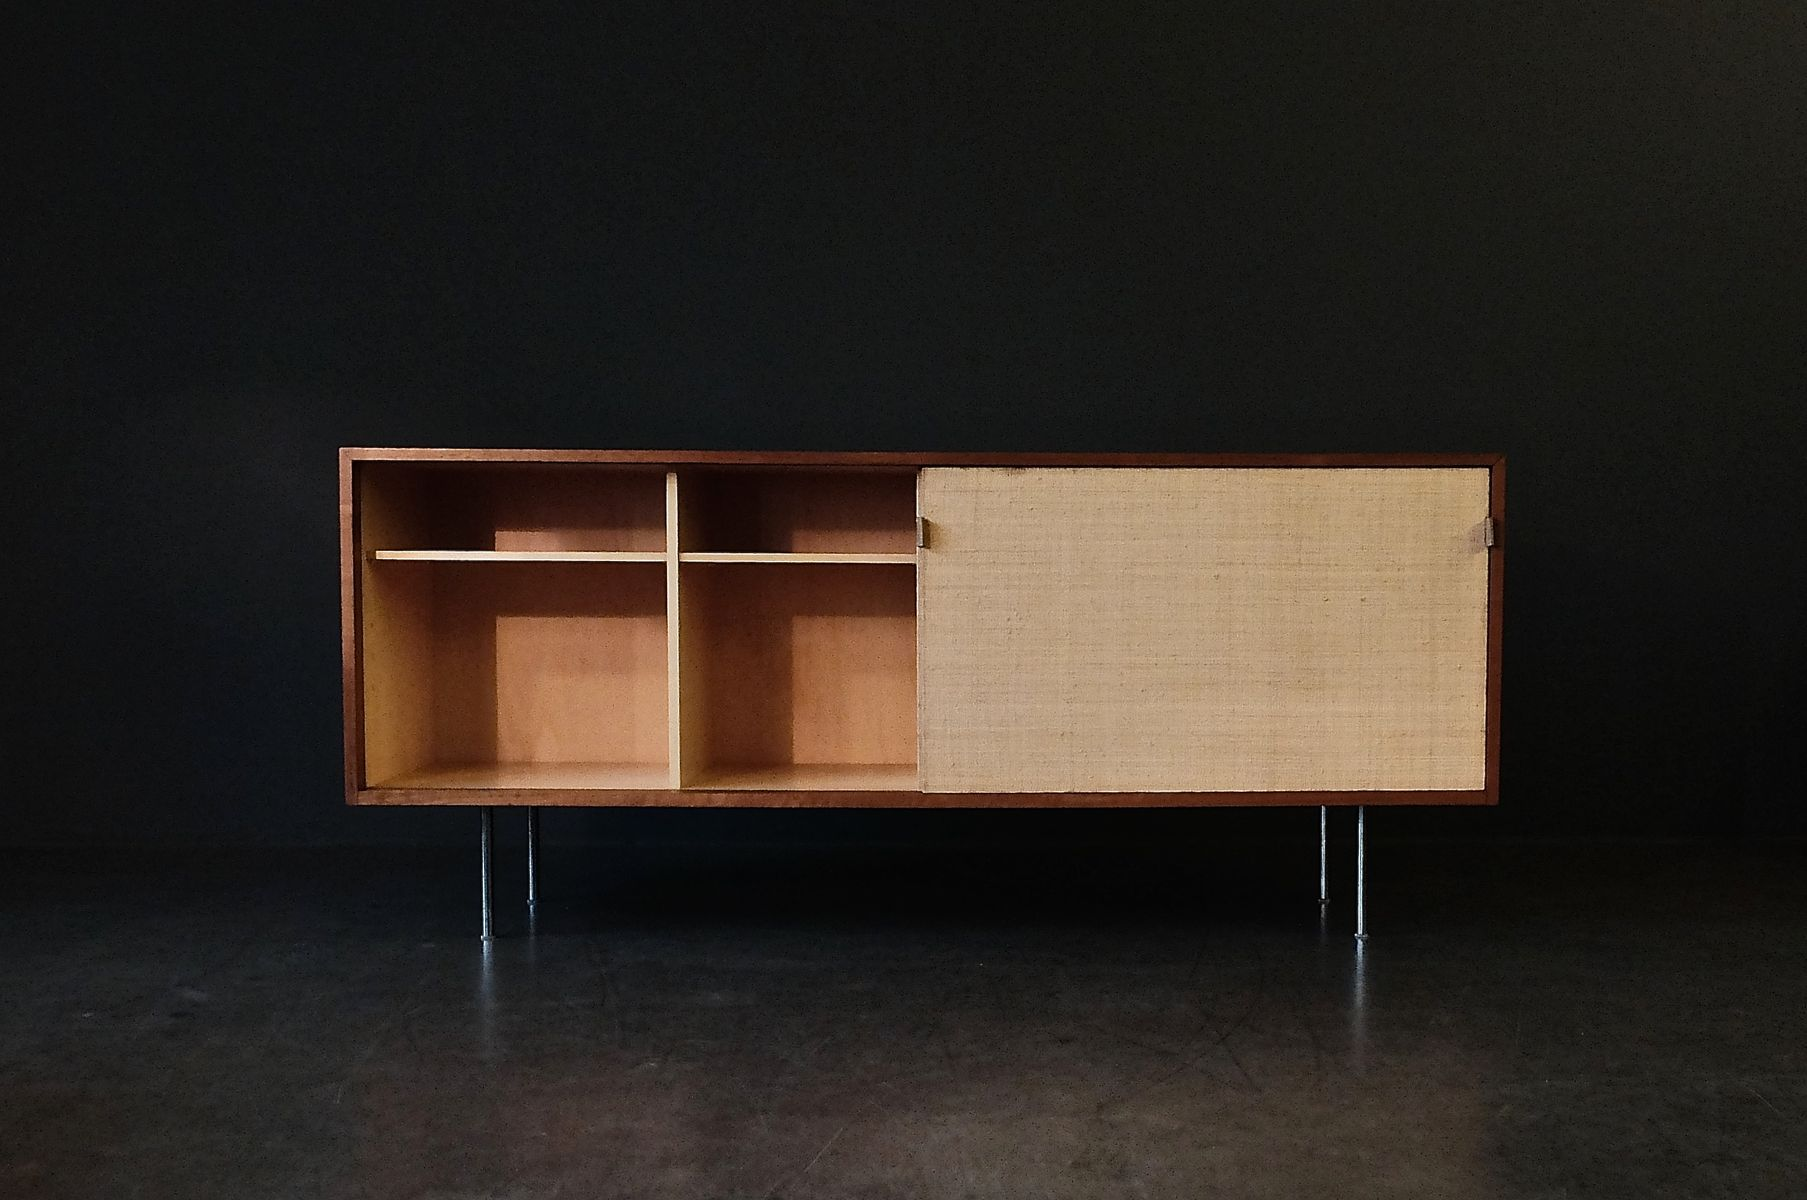 enfilade en noyer en posidonie par florence knoll pour knoll 1960s en vente sur pamono. Black Bedroom Furniture Sets. Home Design Ideas